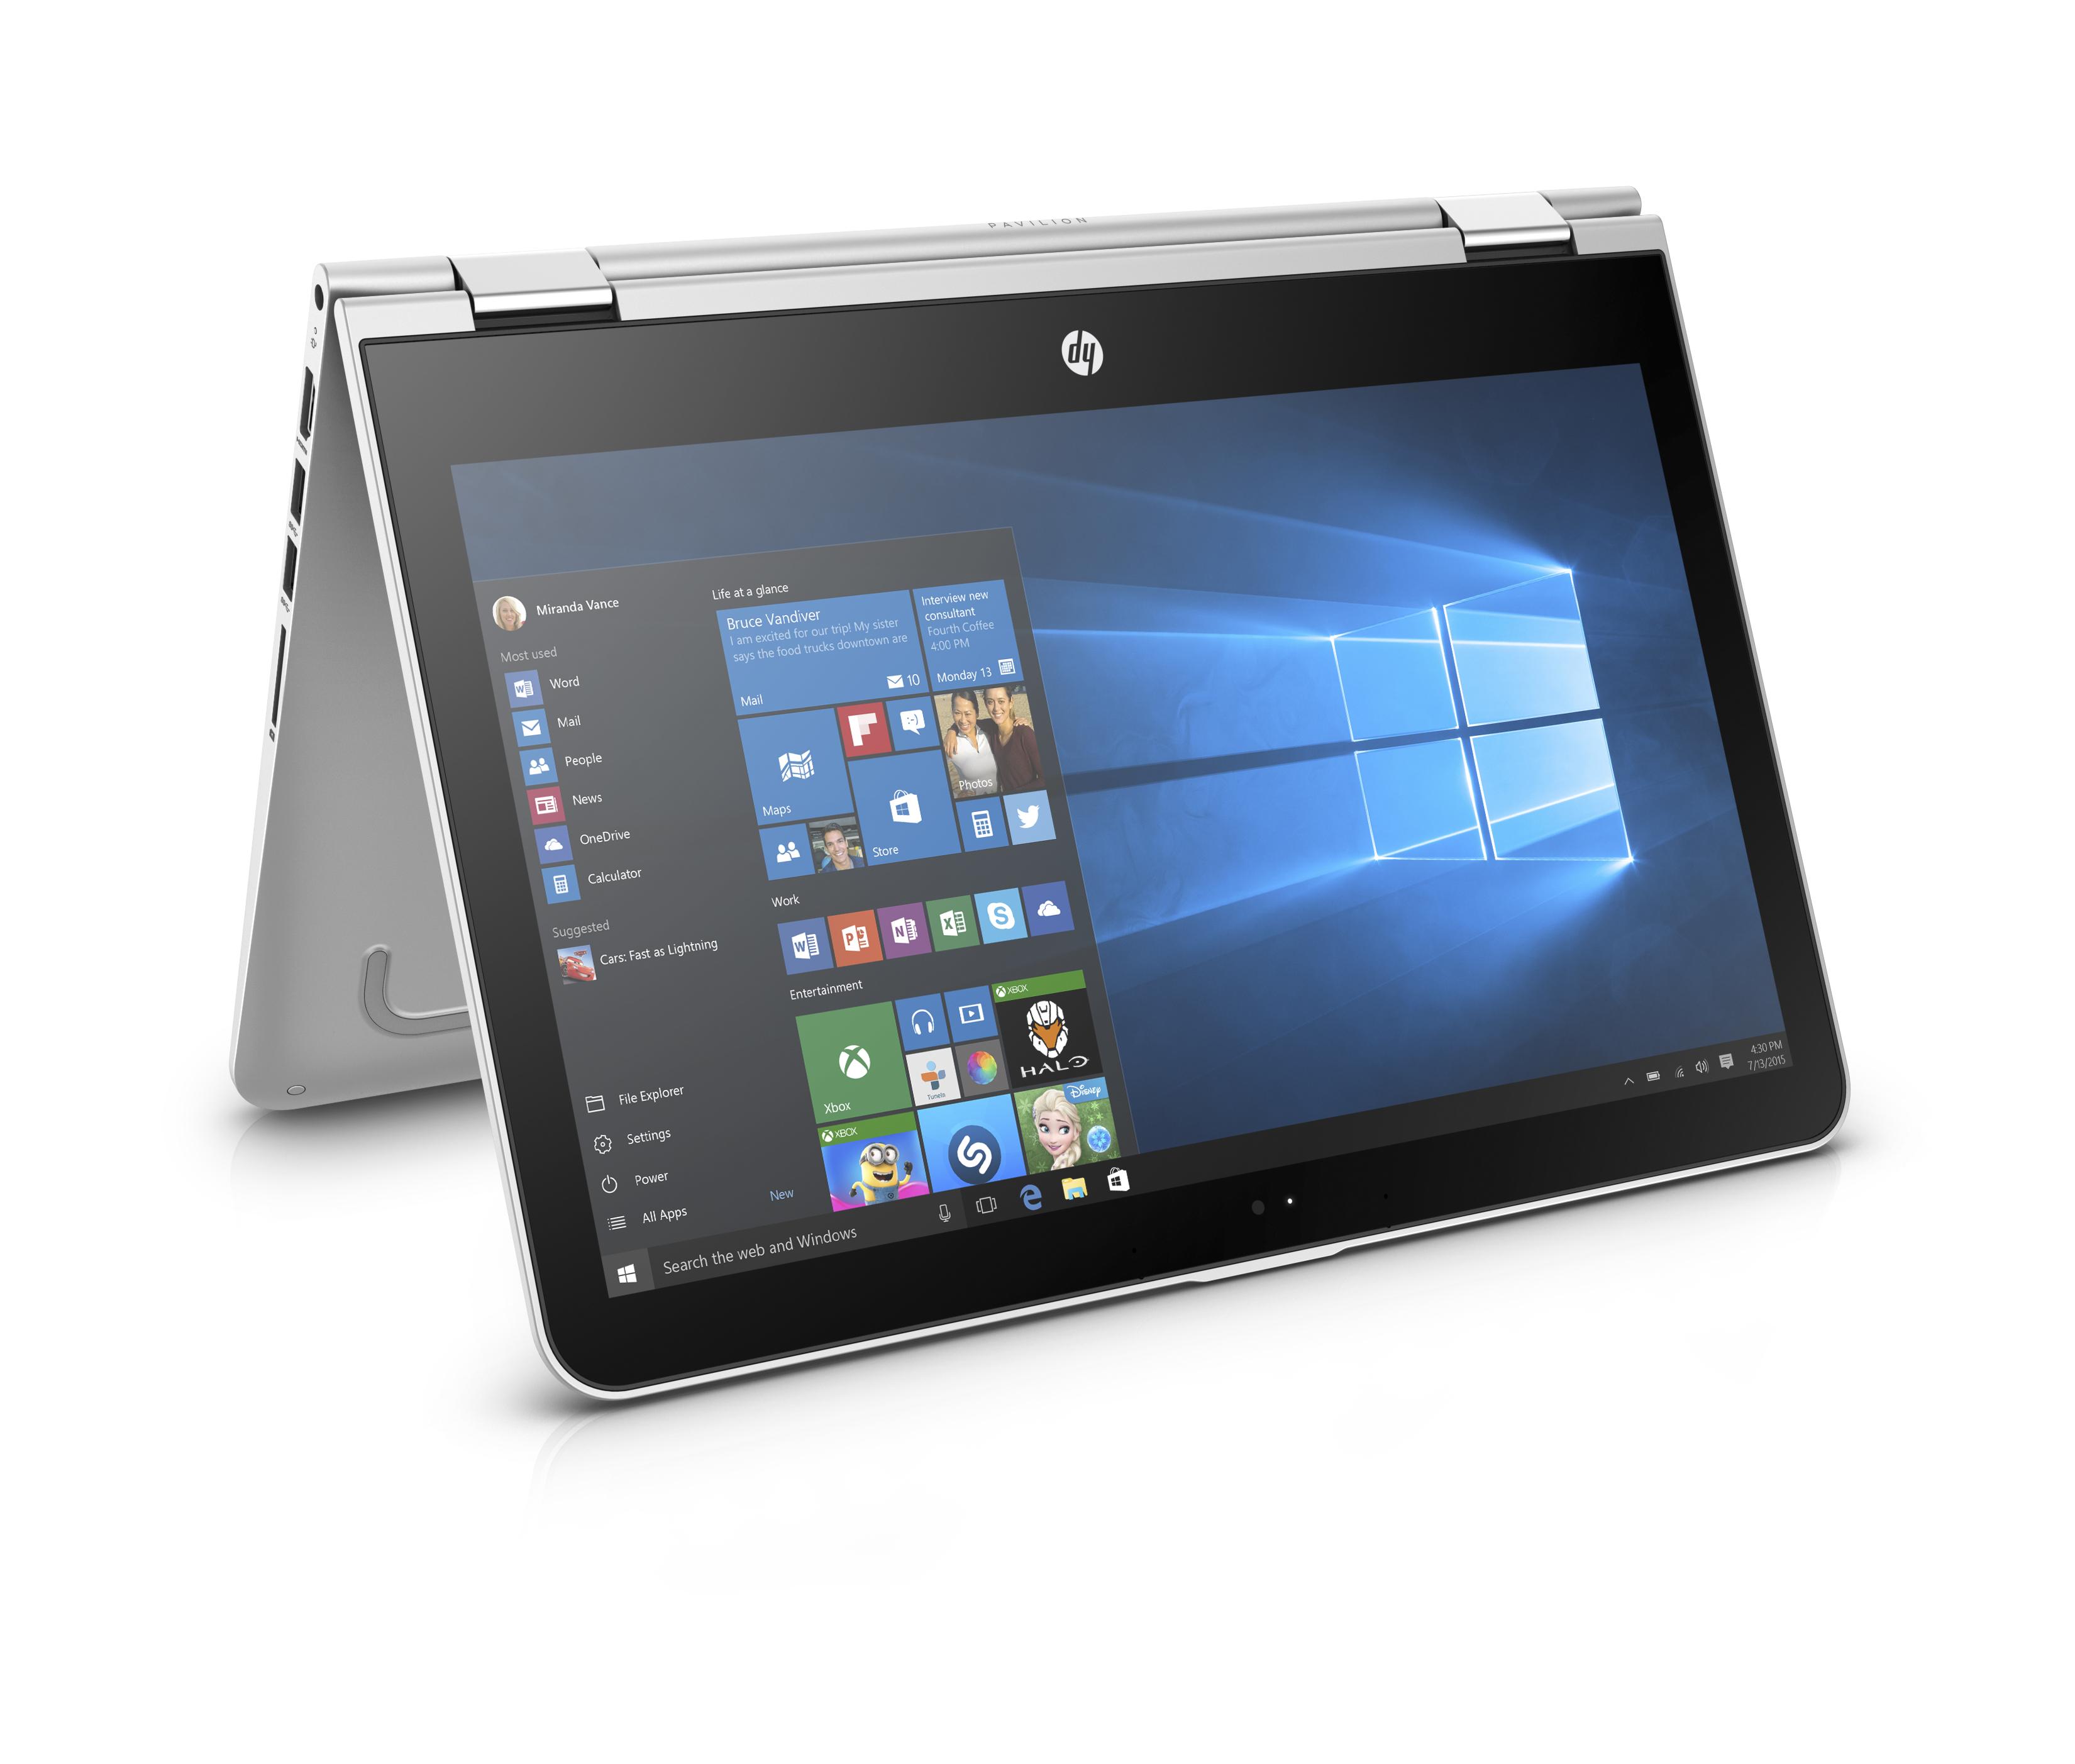 HP Pavilion x360 13-u004nc FHD i3-6100U/4GB/500GB+8GB/2RServis/W10-silver